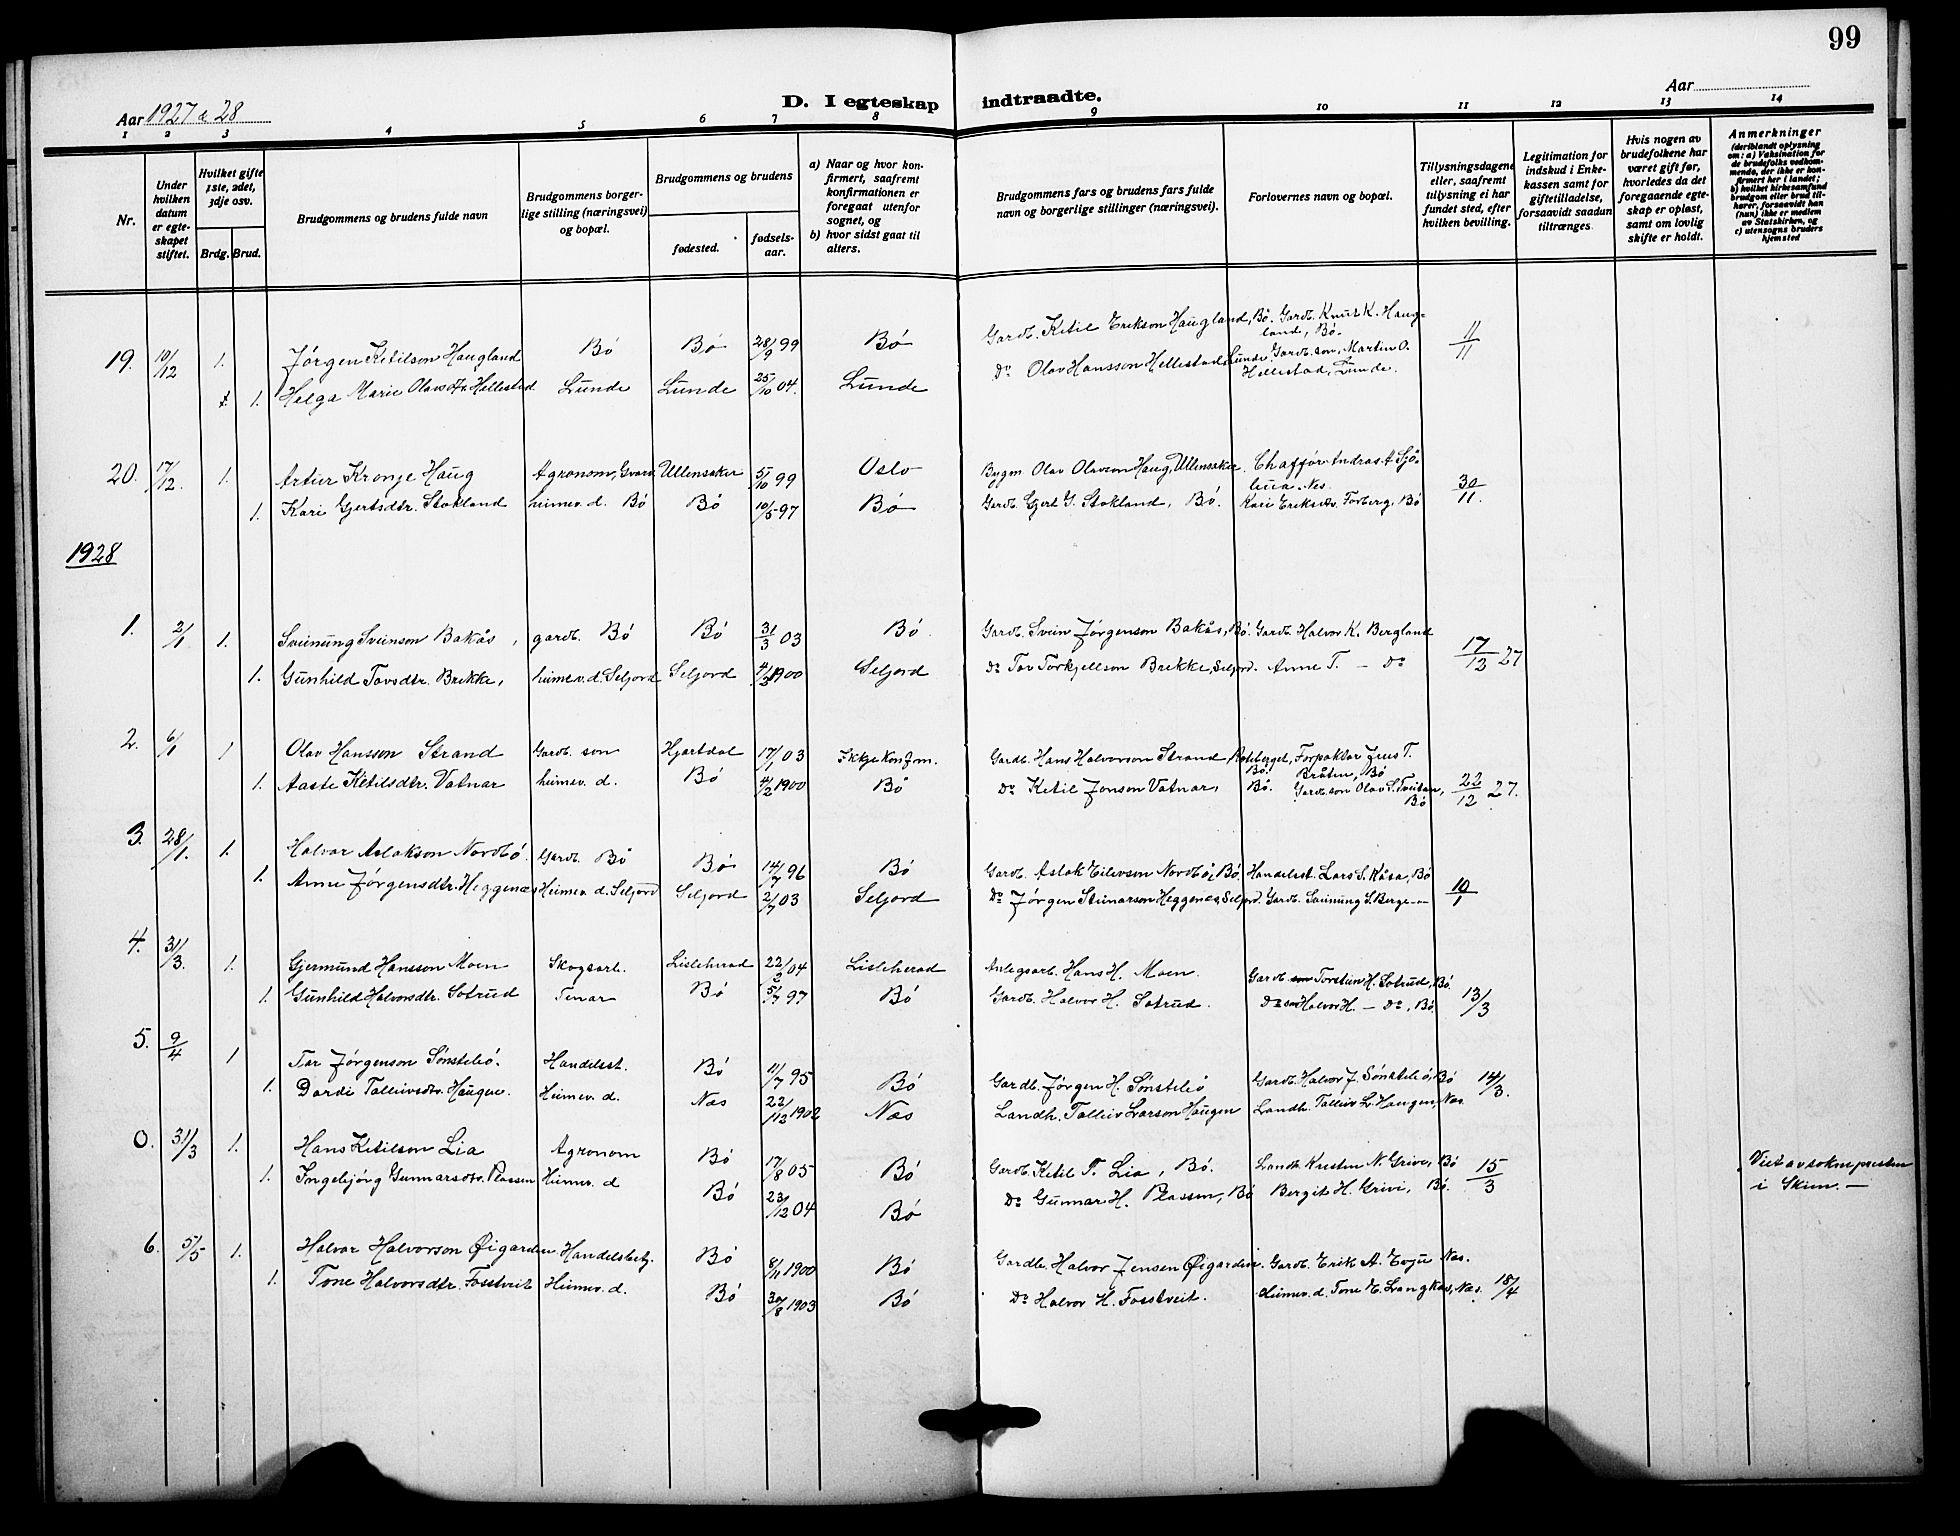 SAKO, Bø kirkebøker, G/Ga/L0008: Klokkerbok nr. 8, 1920-1930, s. 99